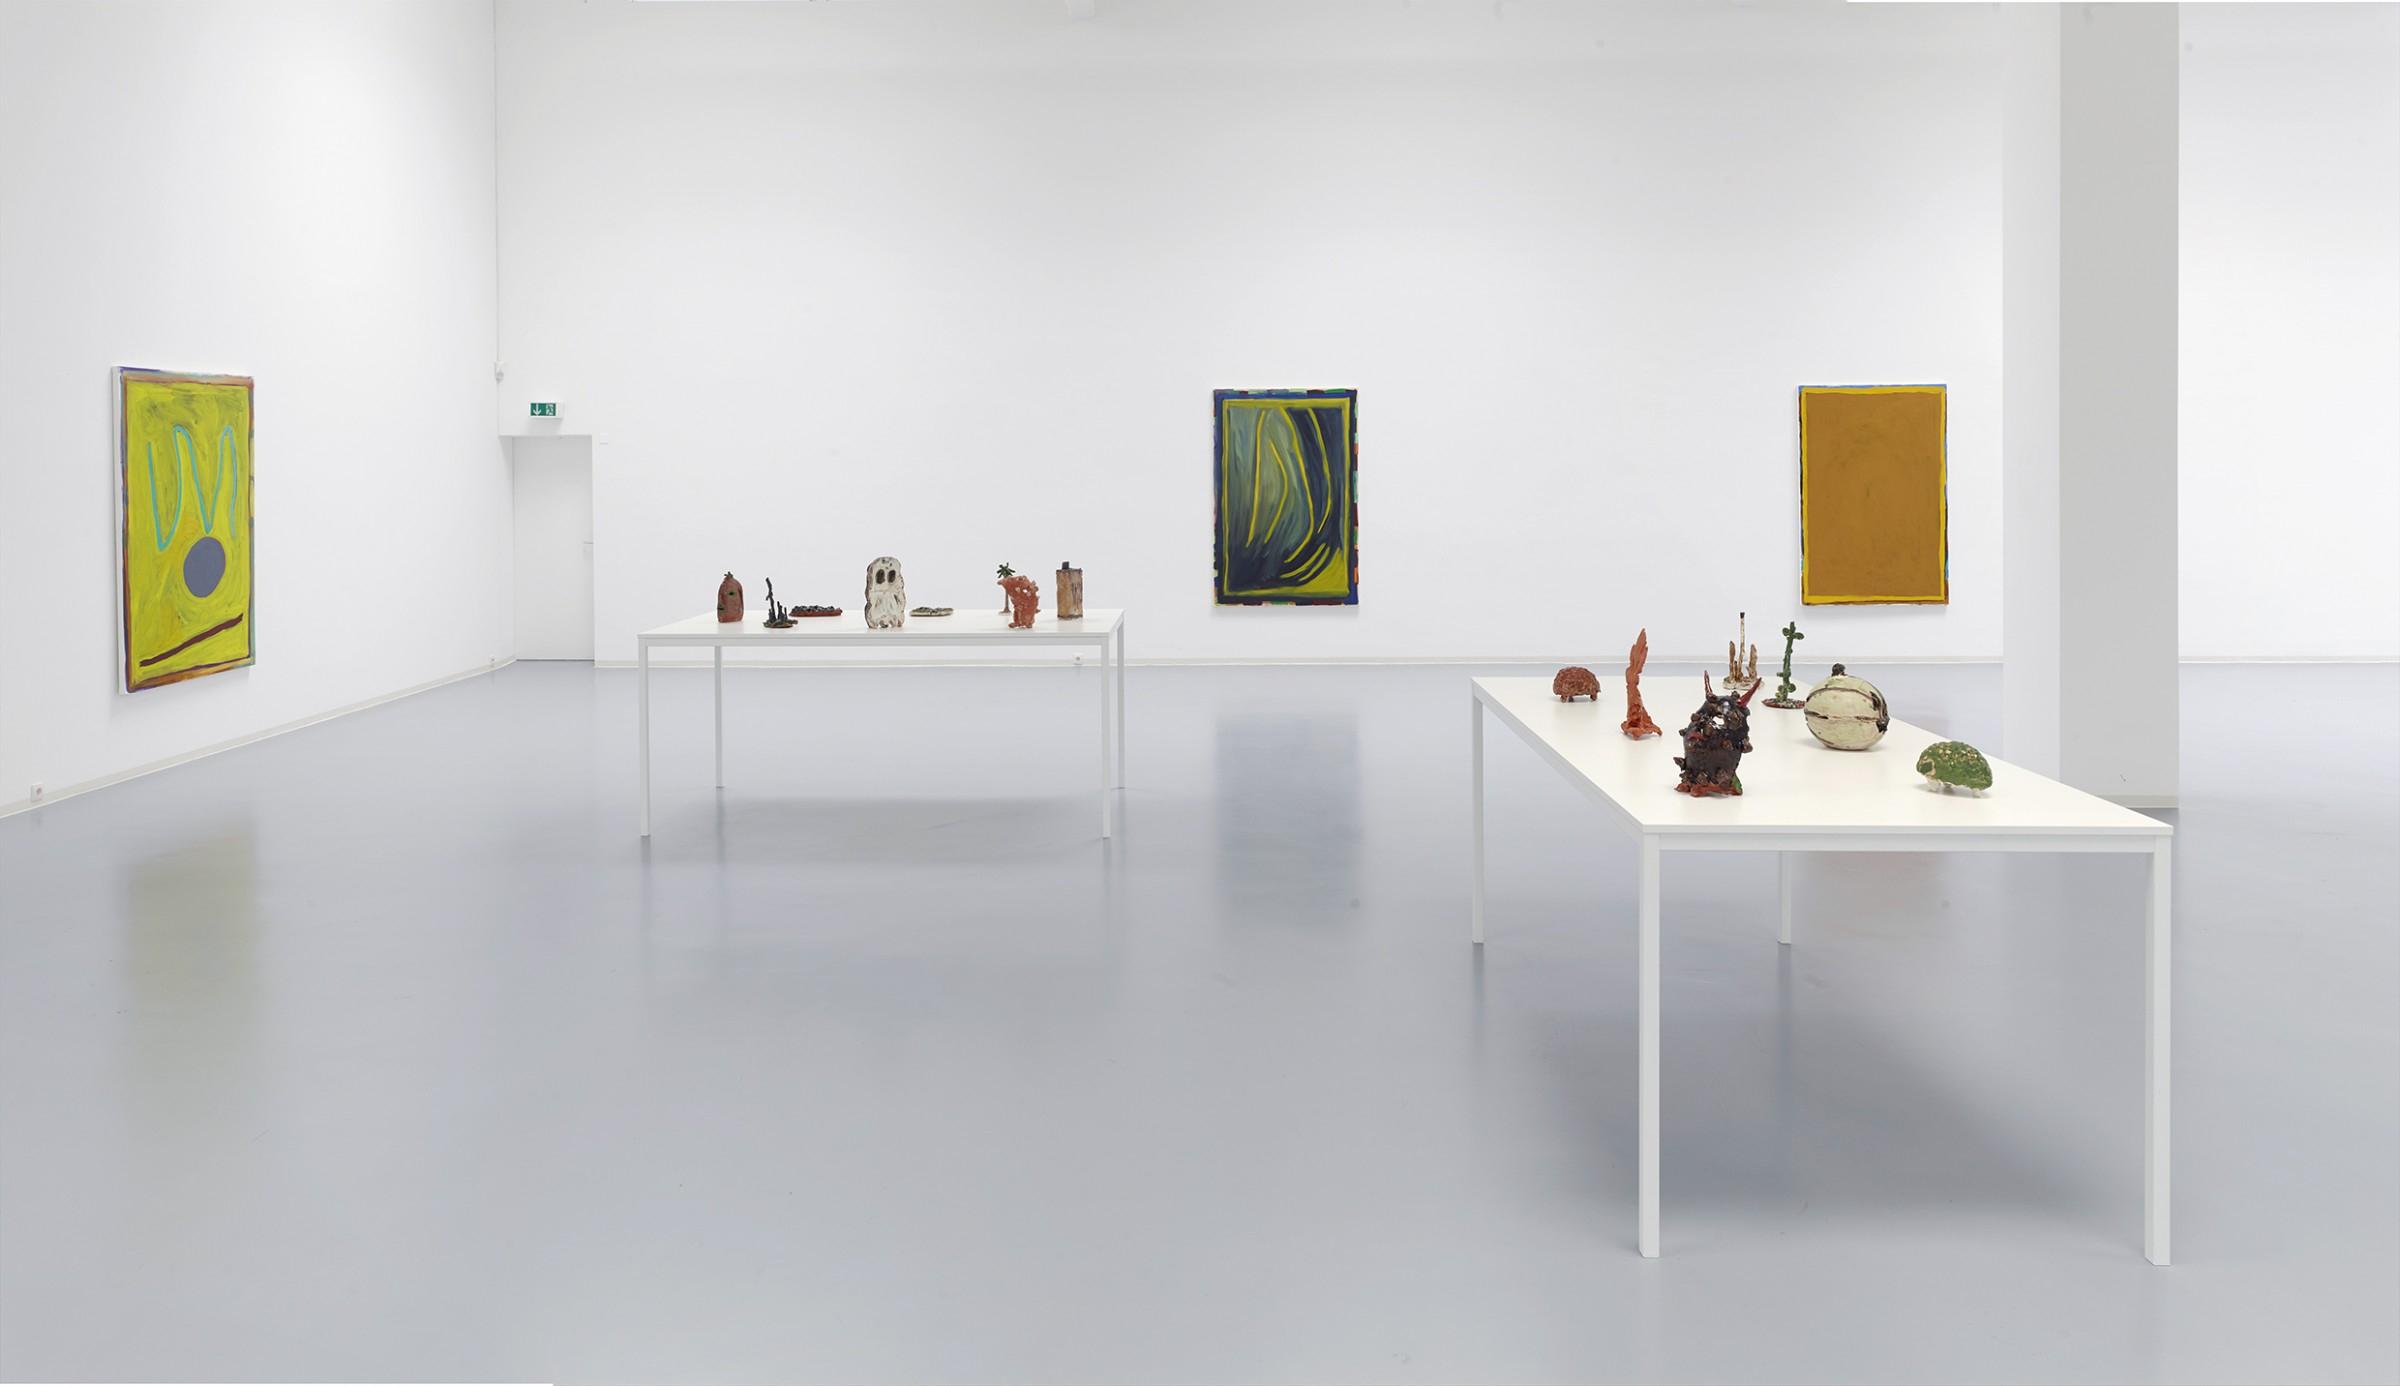 Bonner Kunstverein » Josh Smith à Arte Design Factory 2.0